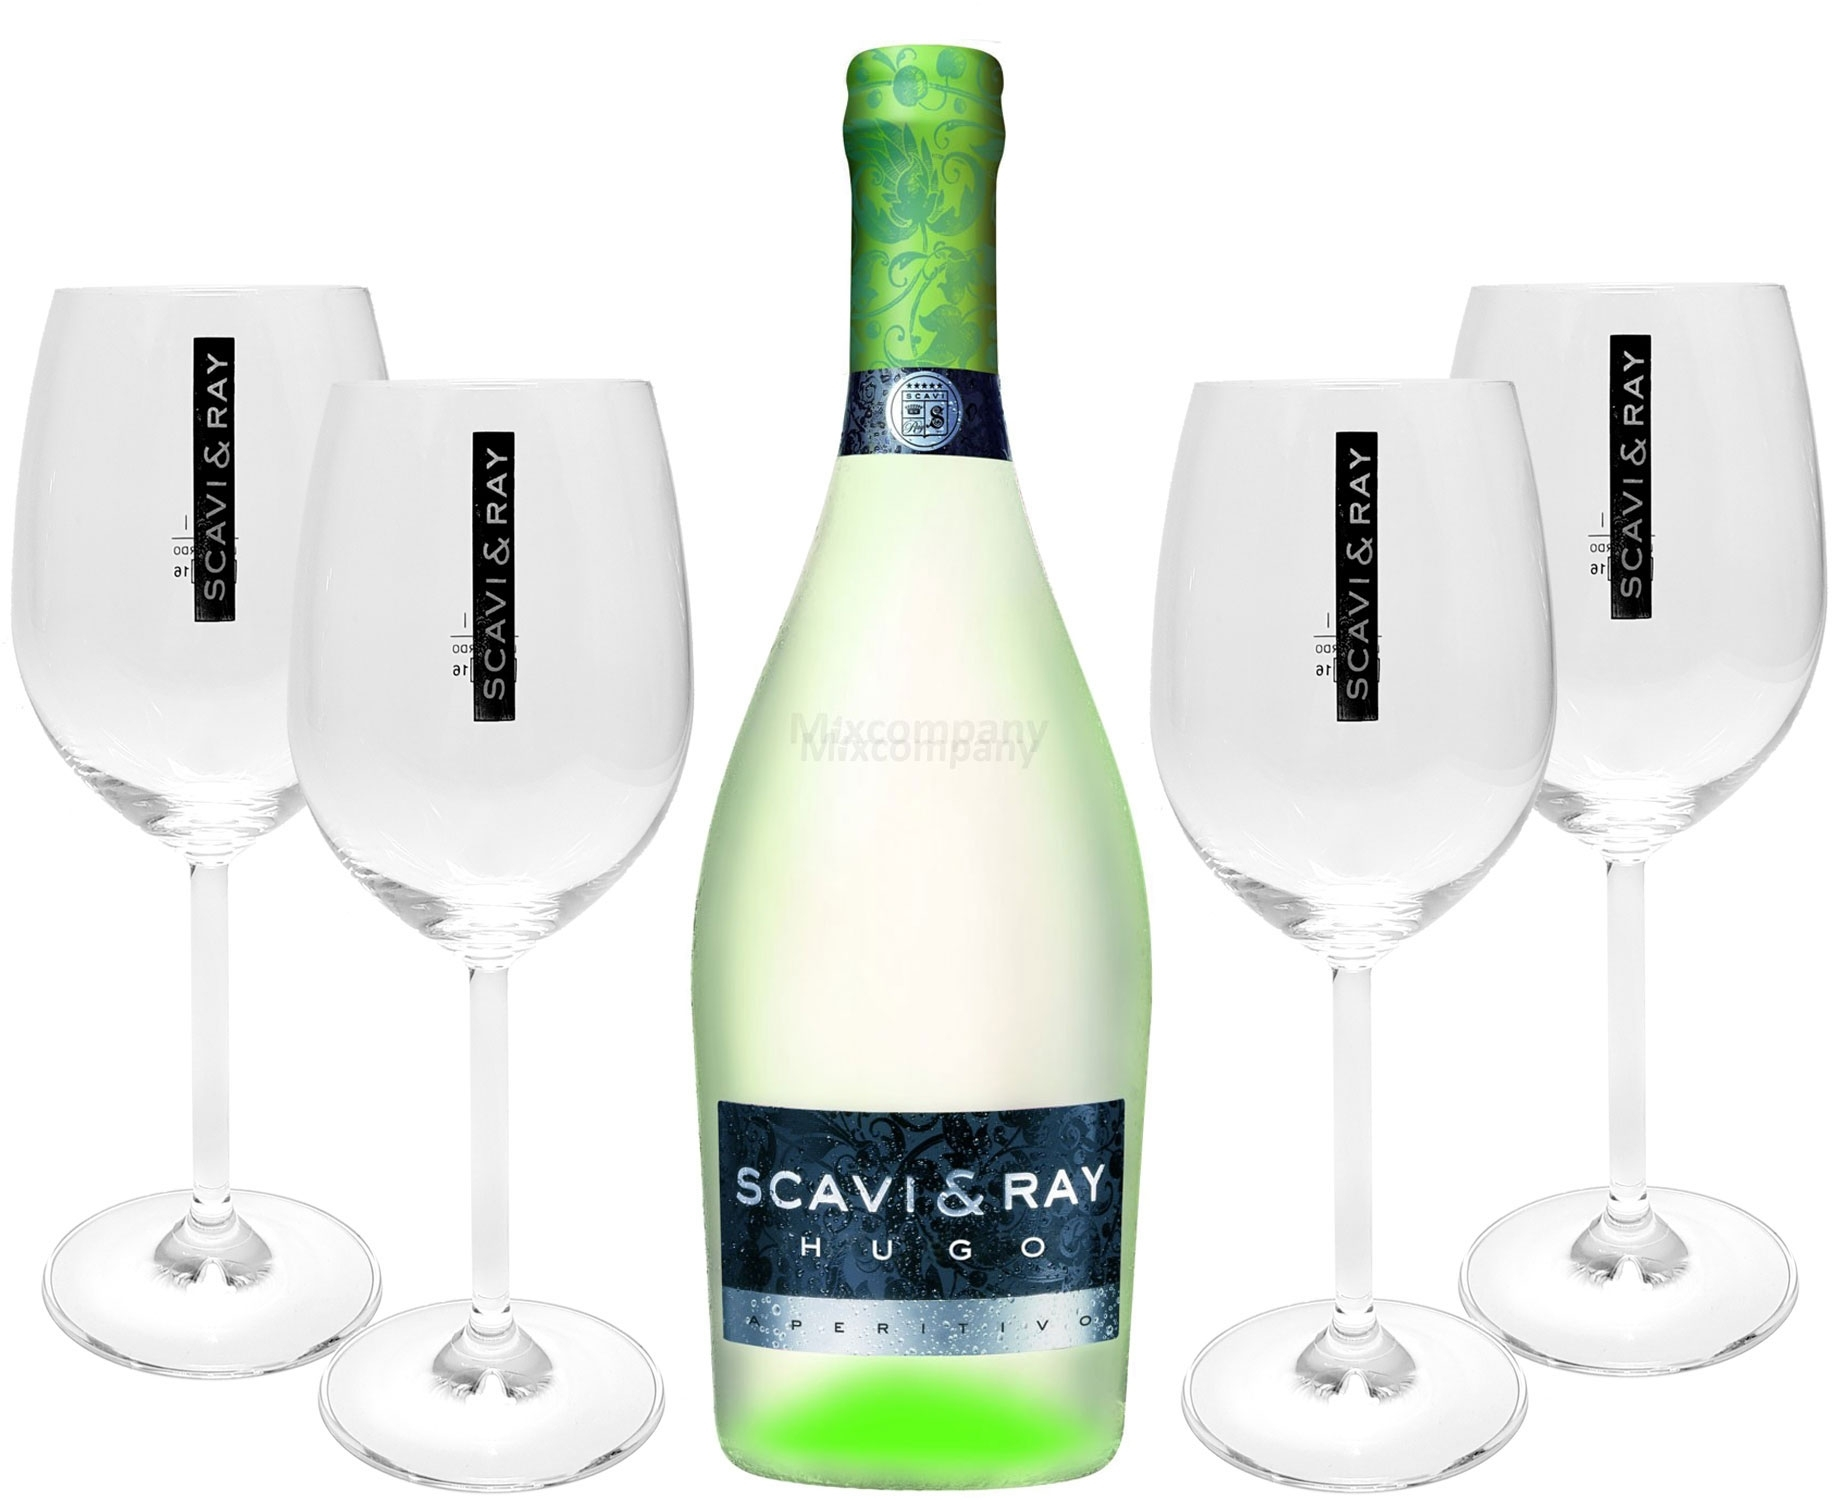 Scavi & Ray Hugo Aperitivo 0,75l (6% Vol) + 4x Ballon Gläser (20cl) -[Enthält Sulfite]